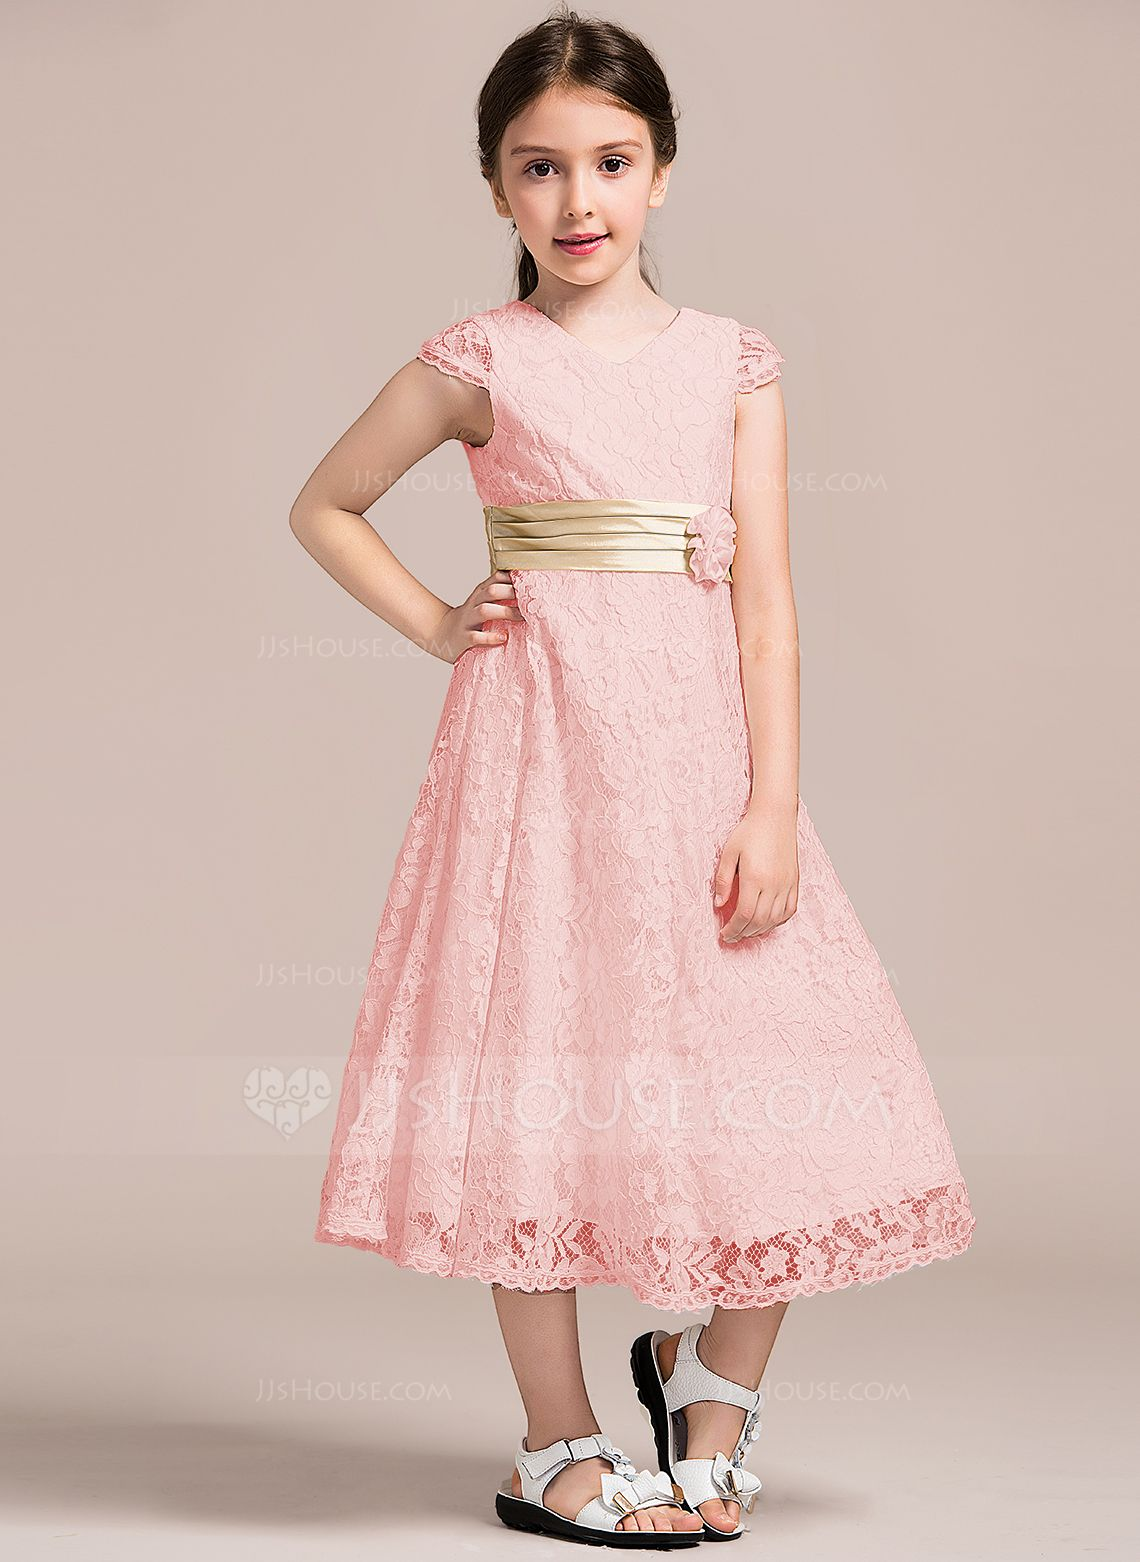 d080496a694d A-Line/Princess V-neck Tea-Length Lace Junior Bridesmaid Dress With Ruffle  Flower(s) (009087904) - Junior Bridesmaid Dresses - JJsHouse